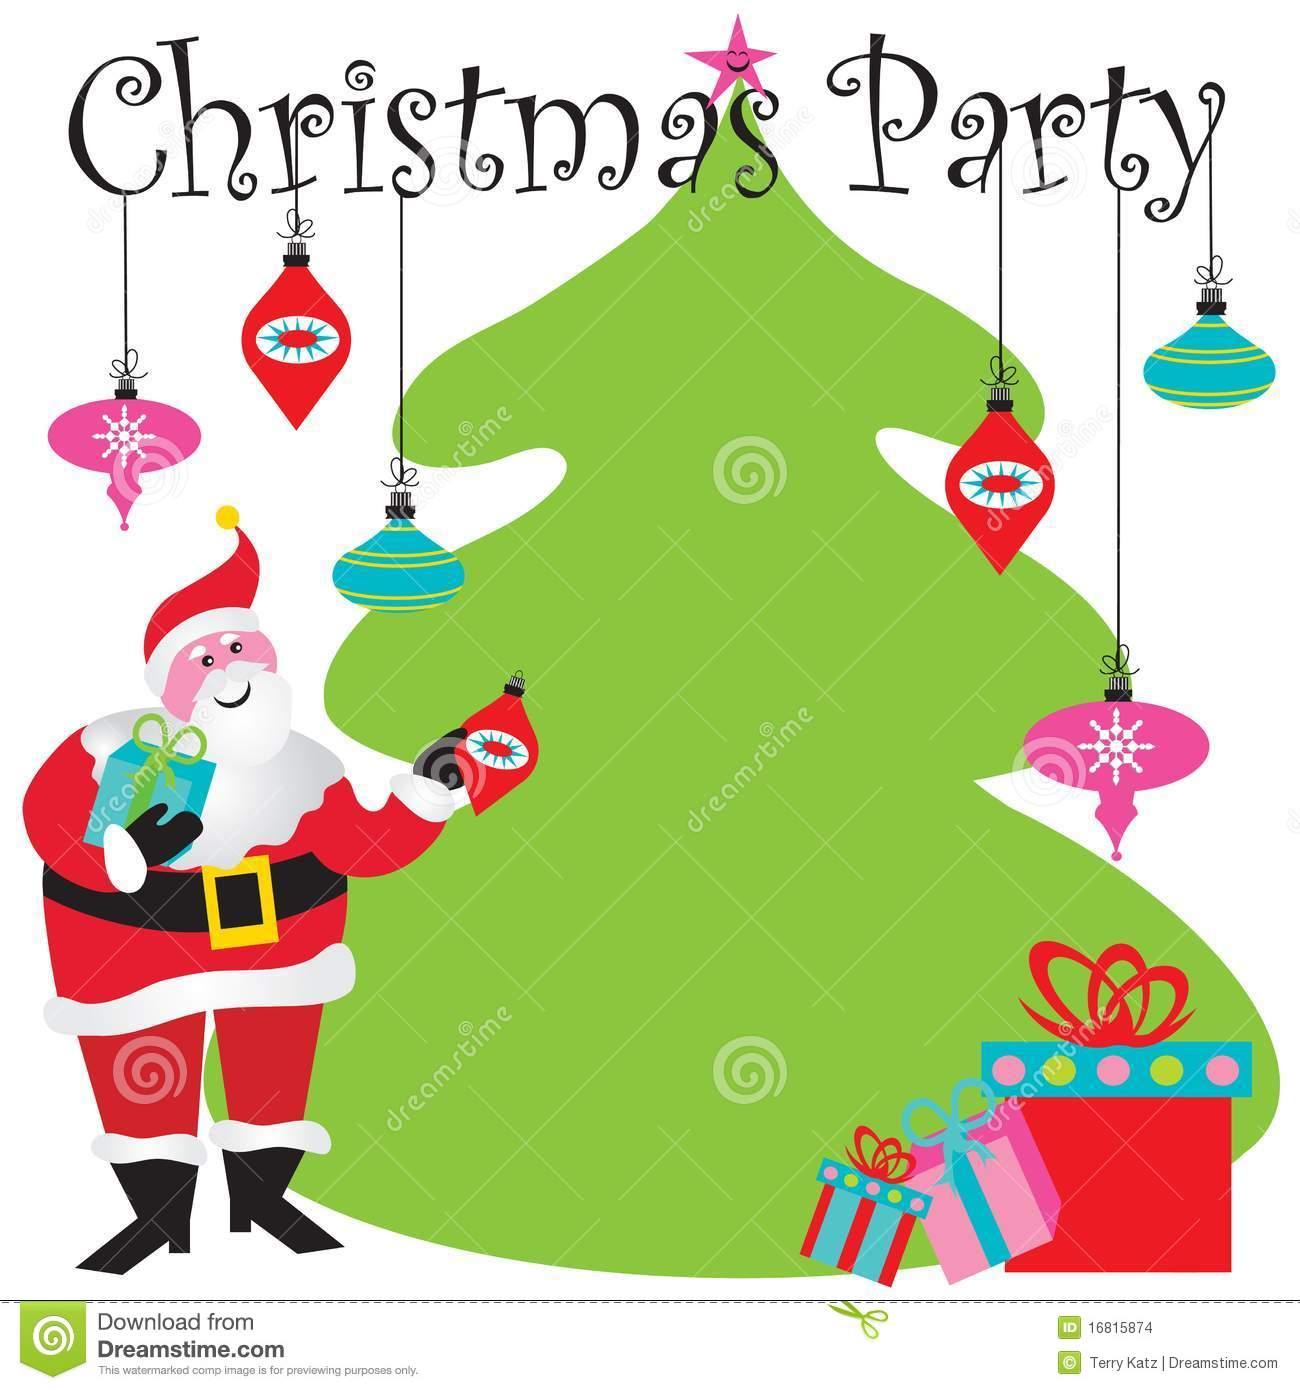 Christmas Party Invite